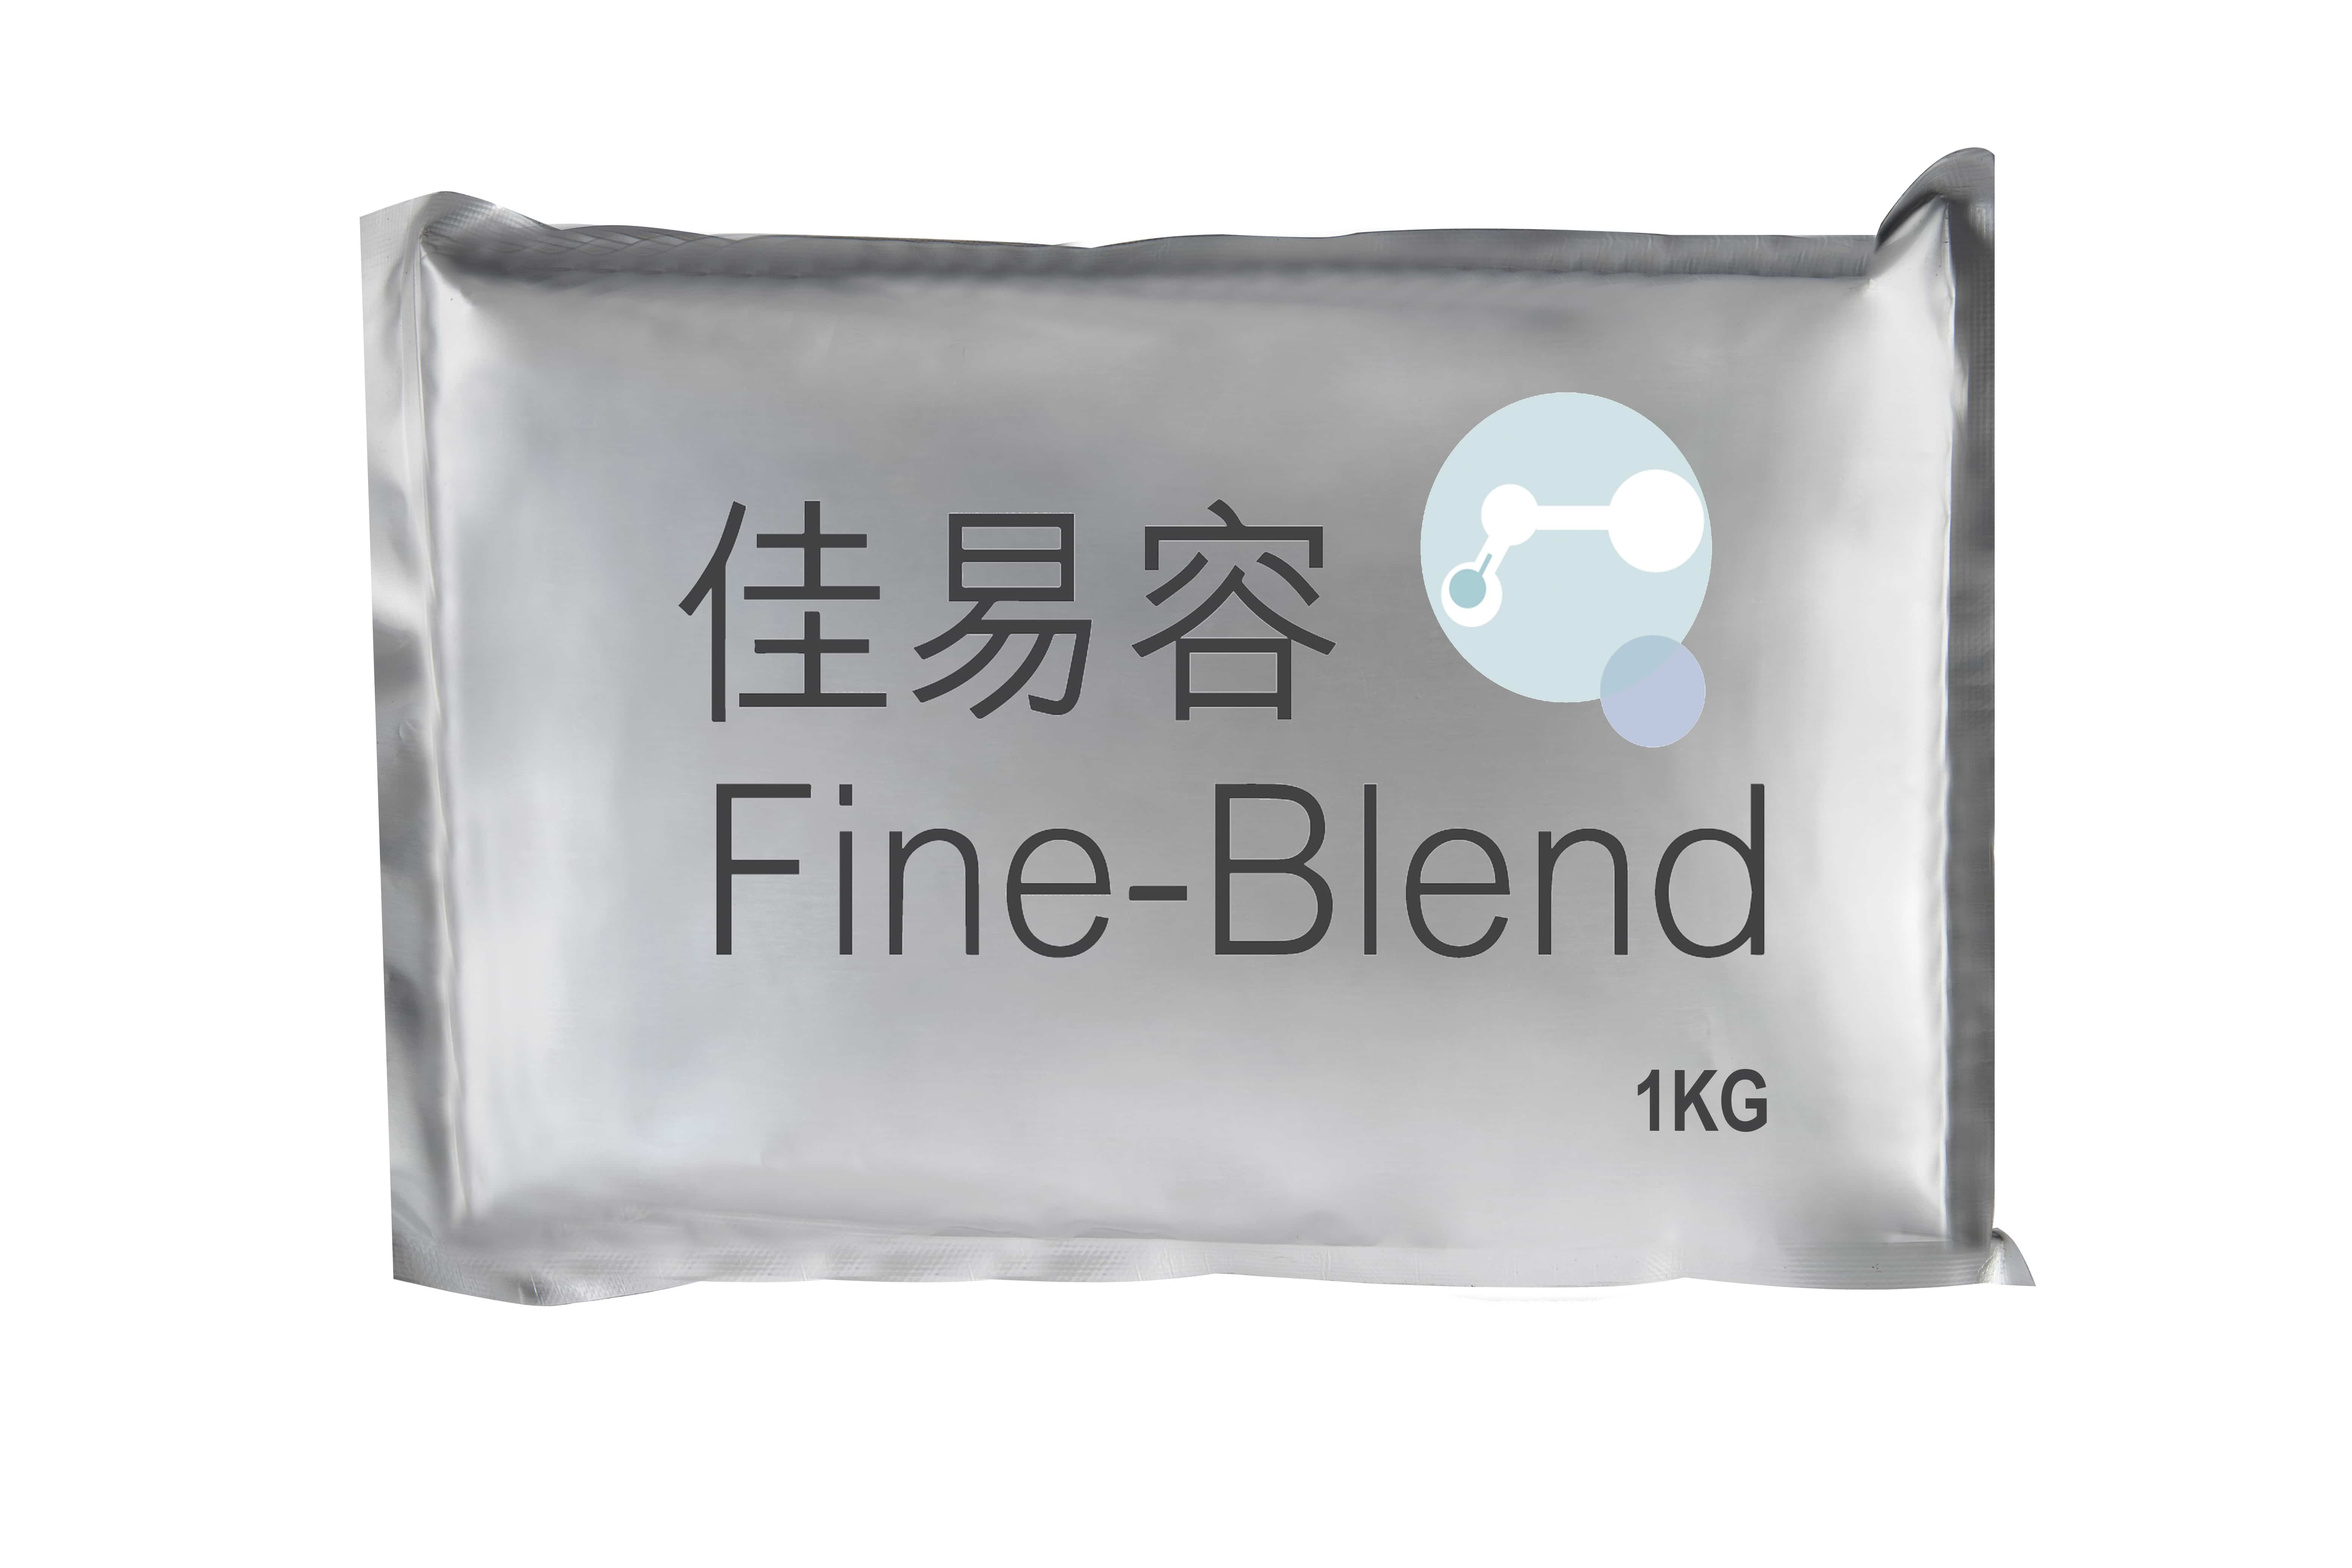 Fine Blend EMI 230B  1 kg (2.2 lb)